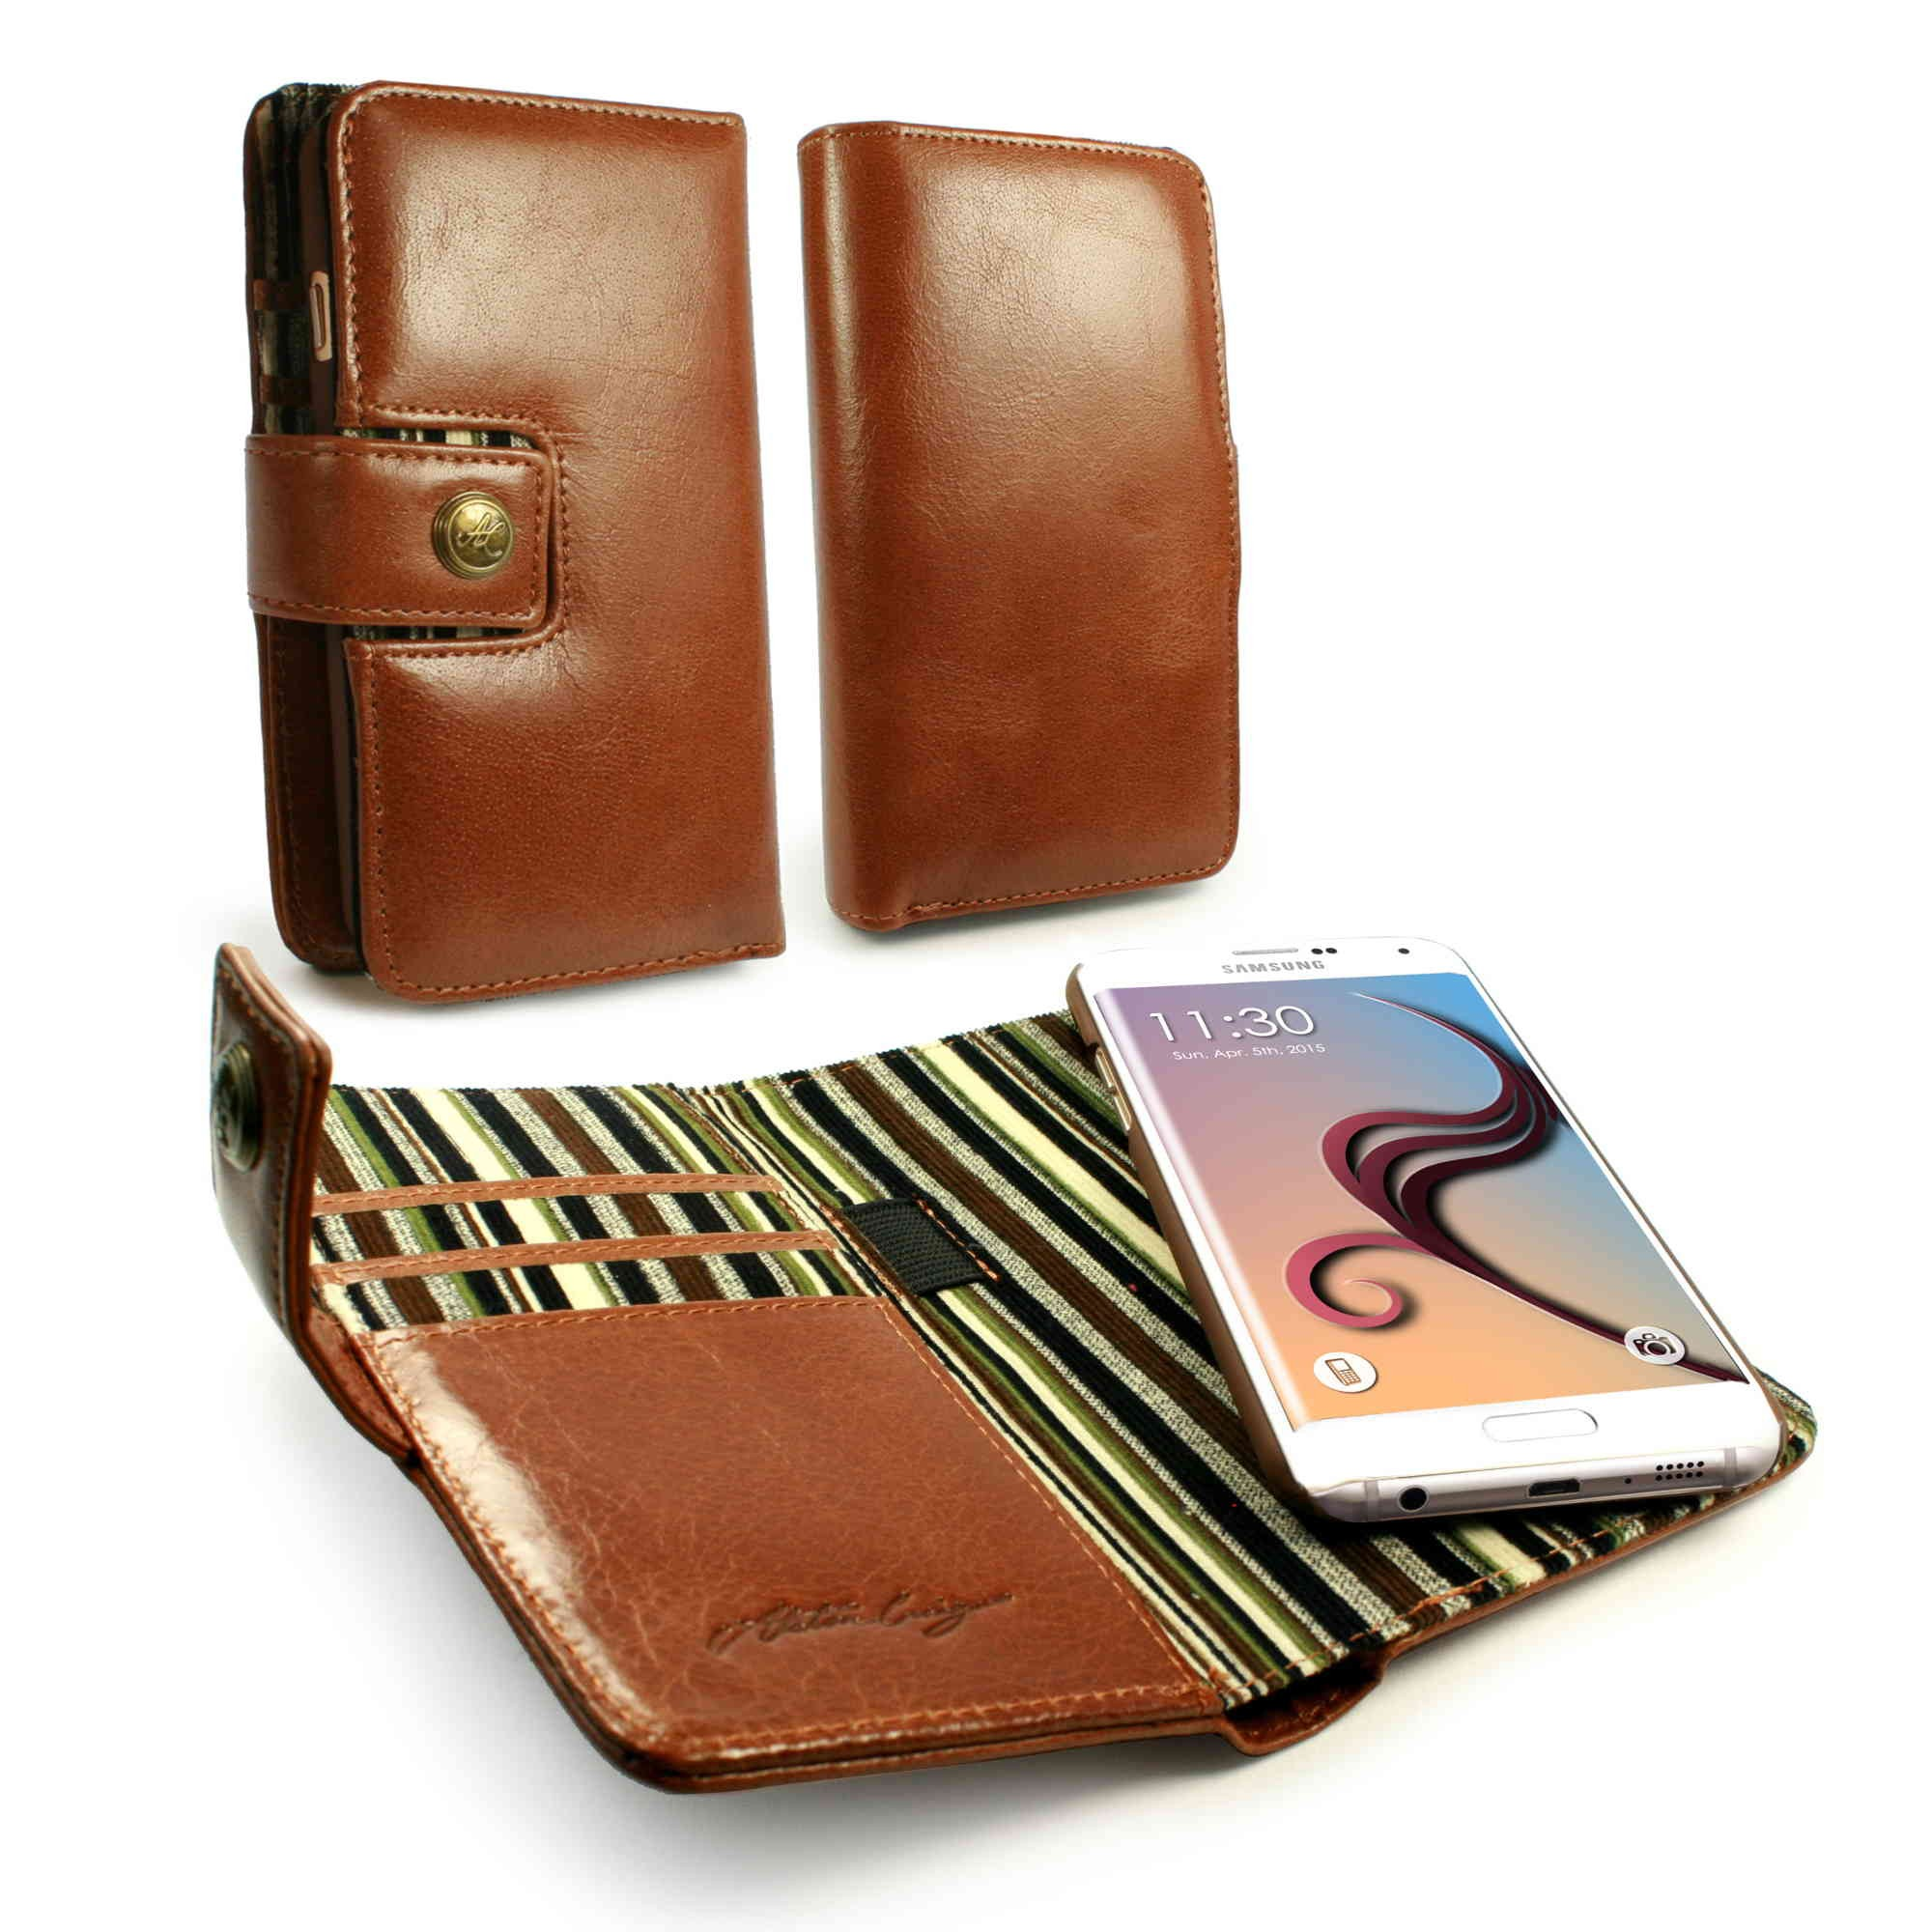 best service c611b a7d69 Details about Alston Craig Alston Craig Genuine Leather Folio Wallet Case  Cover for Galaxy S6